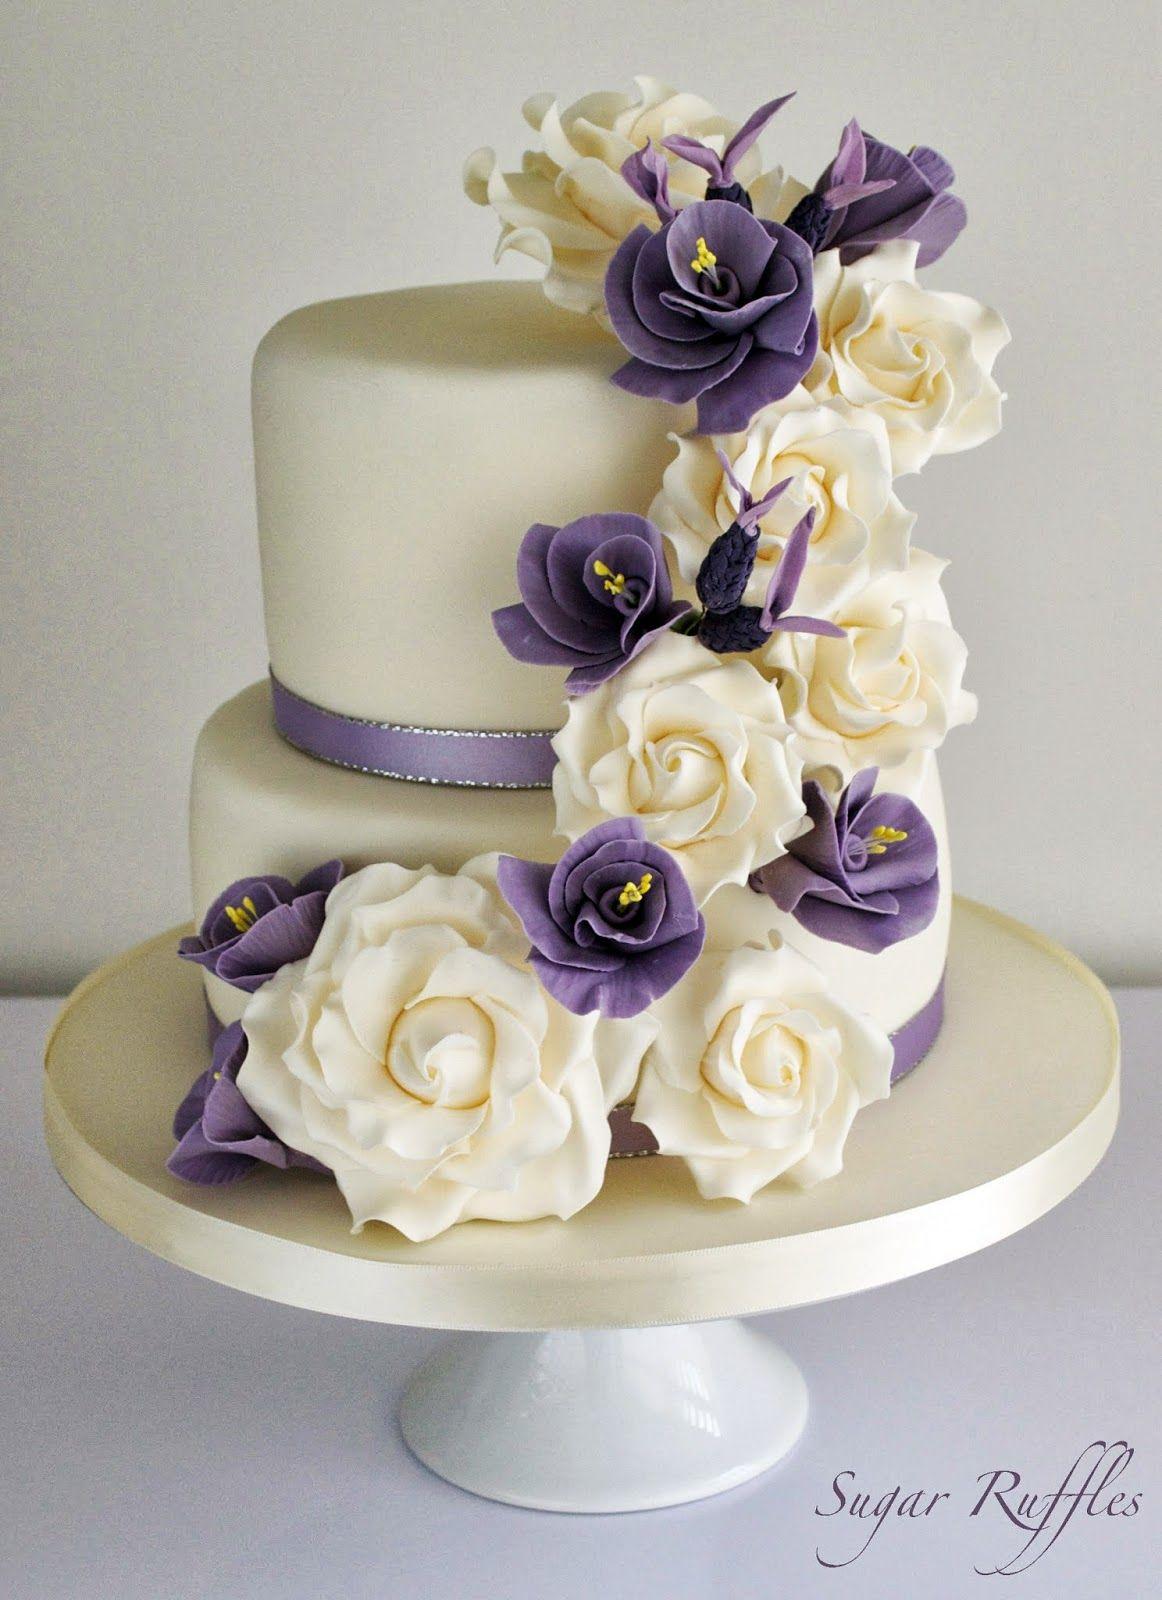 Wedding cake special occasions pinterest elegant wedding cakes